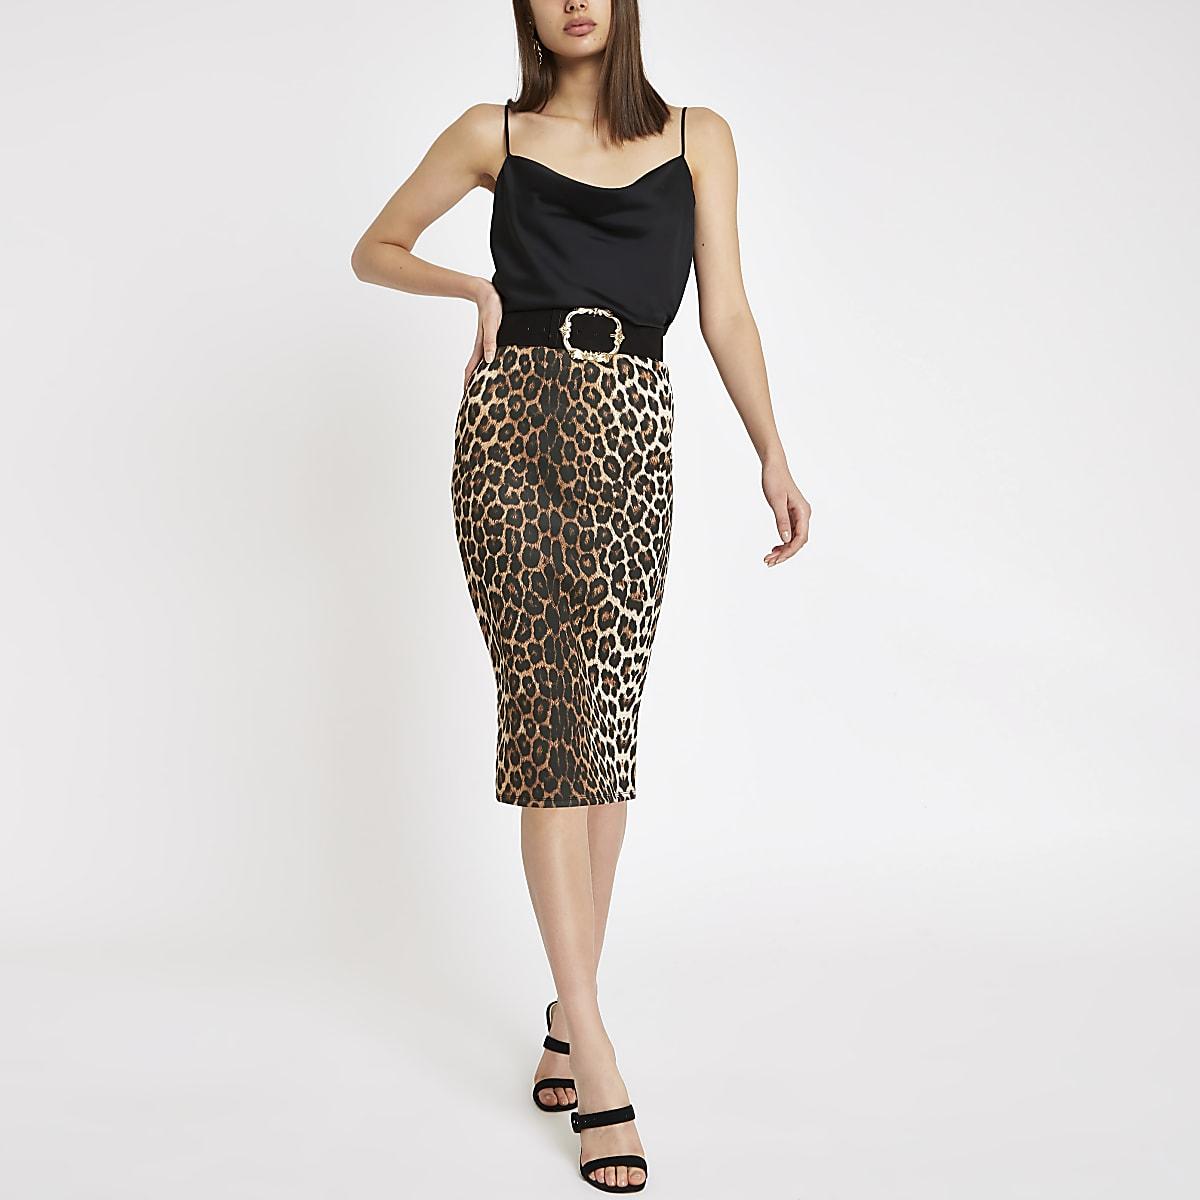 Brown leopard print pencil skirt